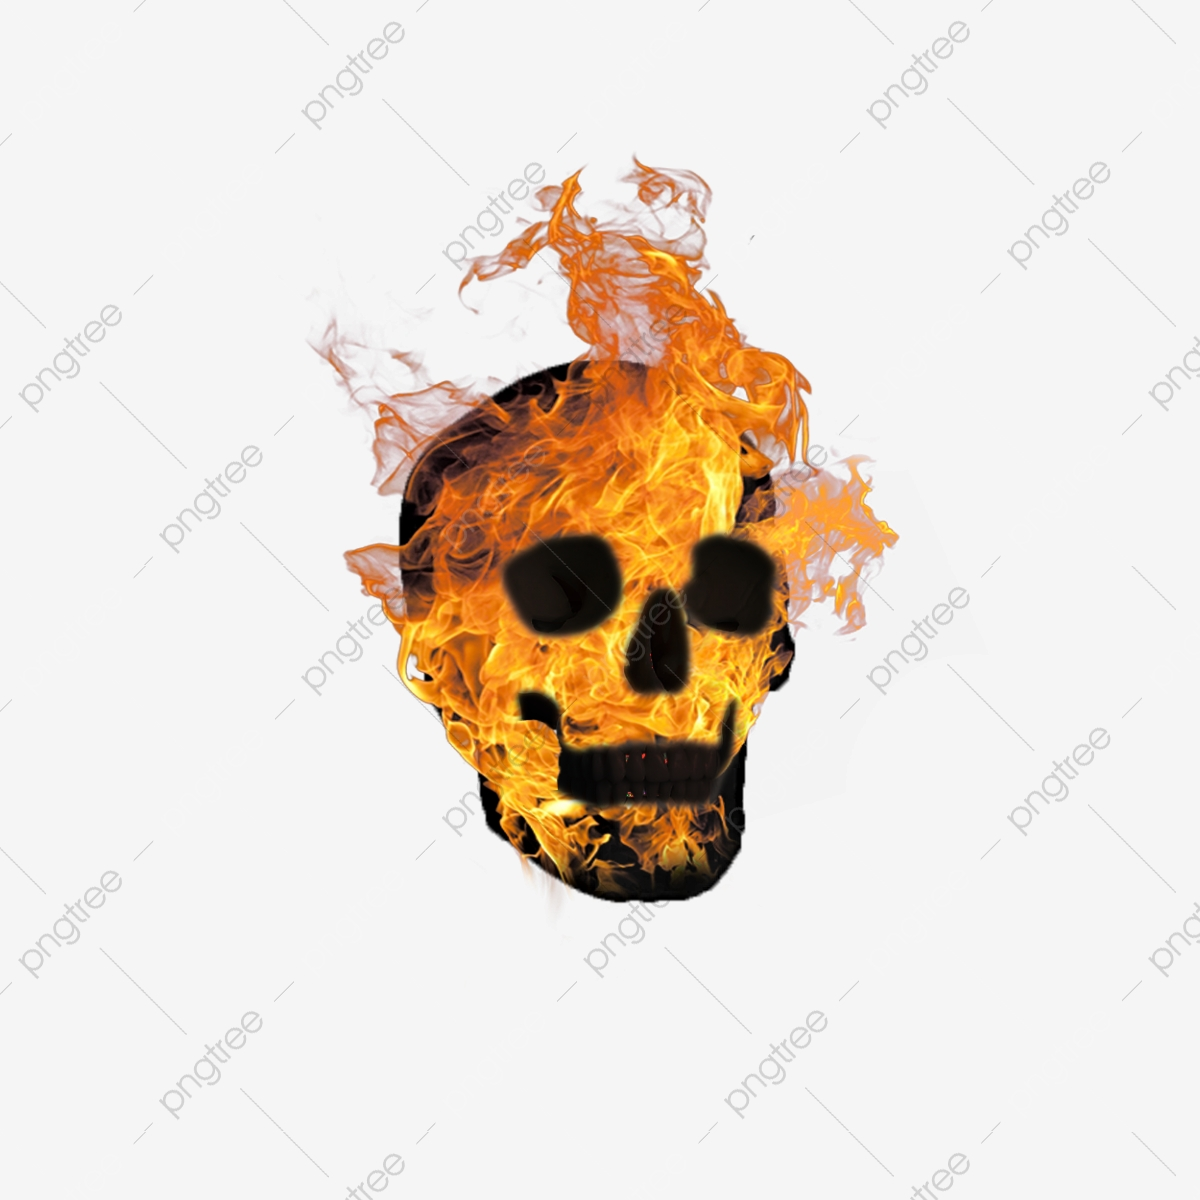 Skull Logo, Skull Clipart, Logo Clipart, Skull Element PNG